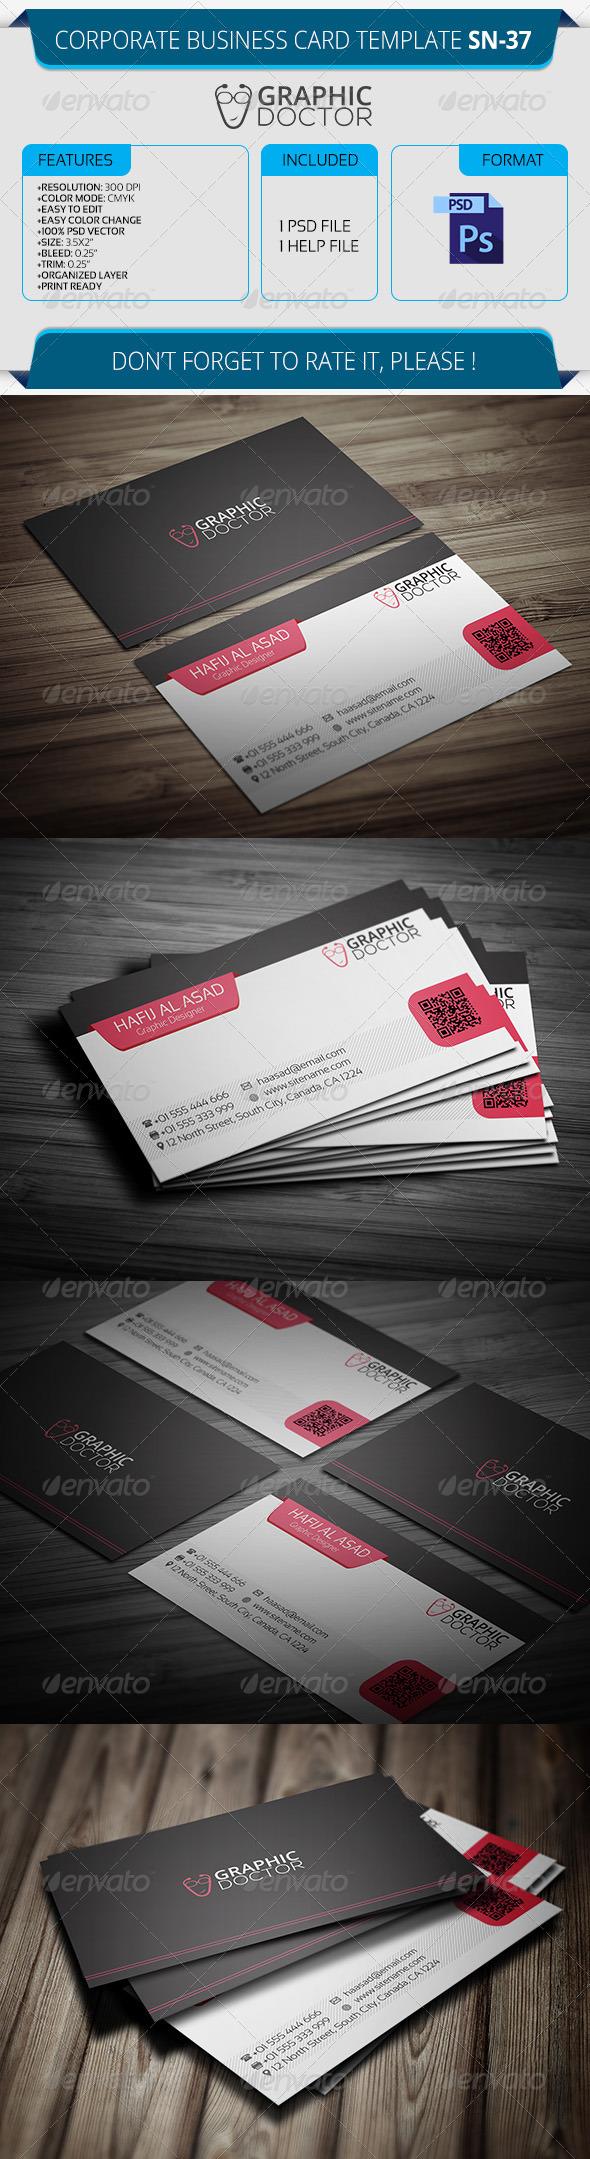 Corporate Business Card Template SN-37 - Corporate Business Cards